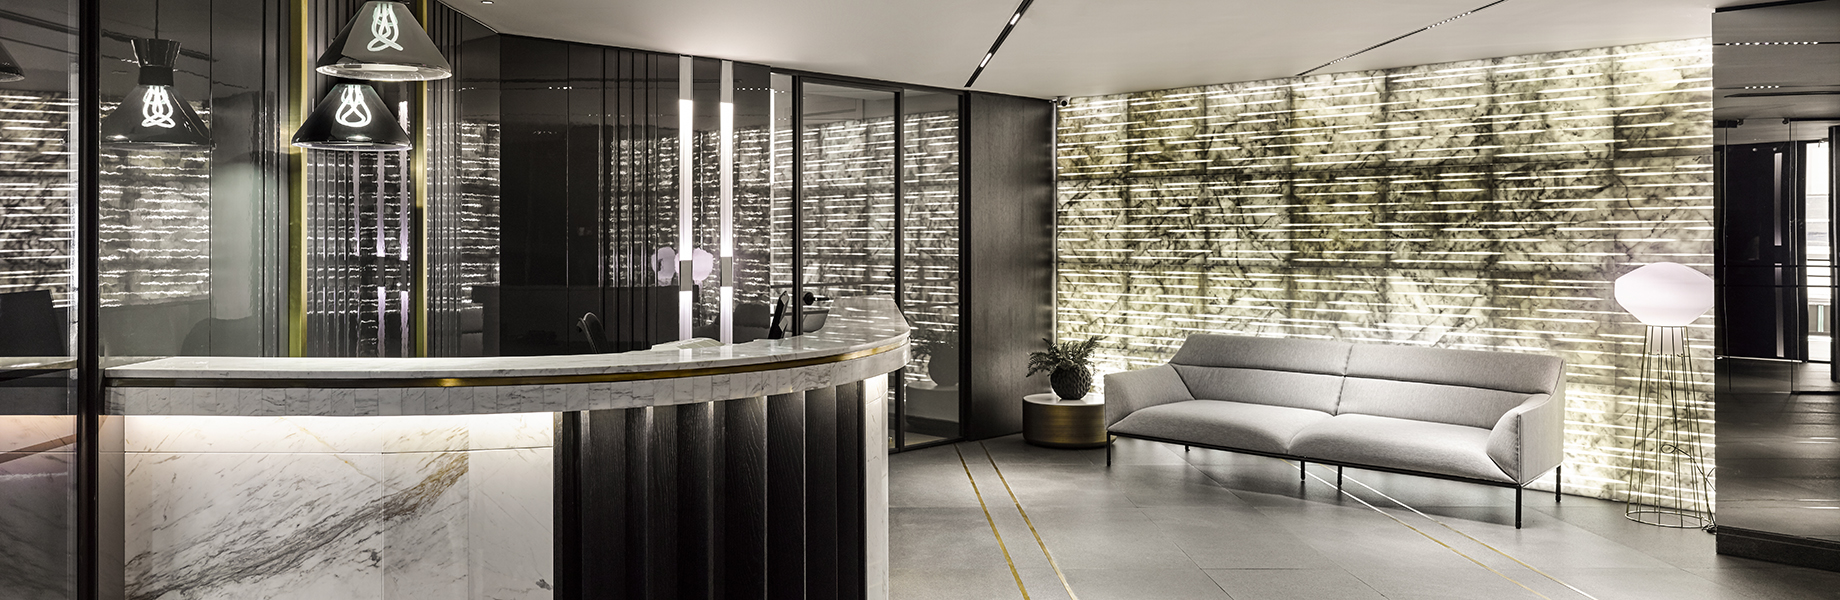 mizar backlit wall tiles